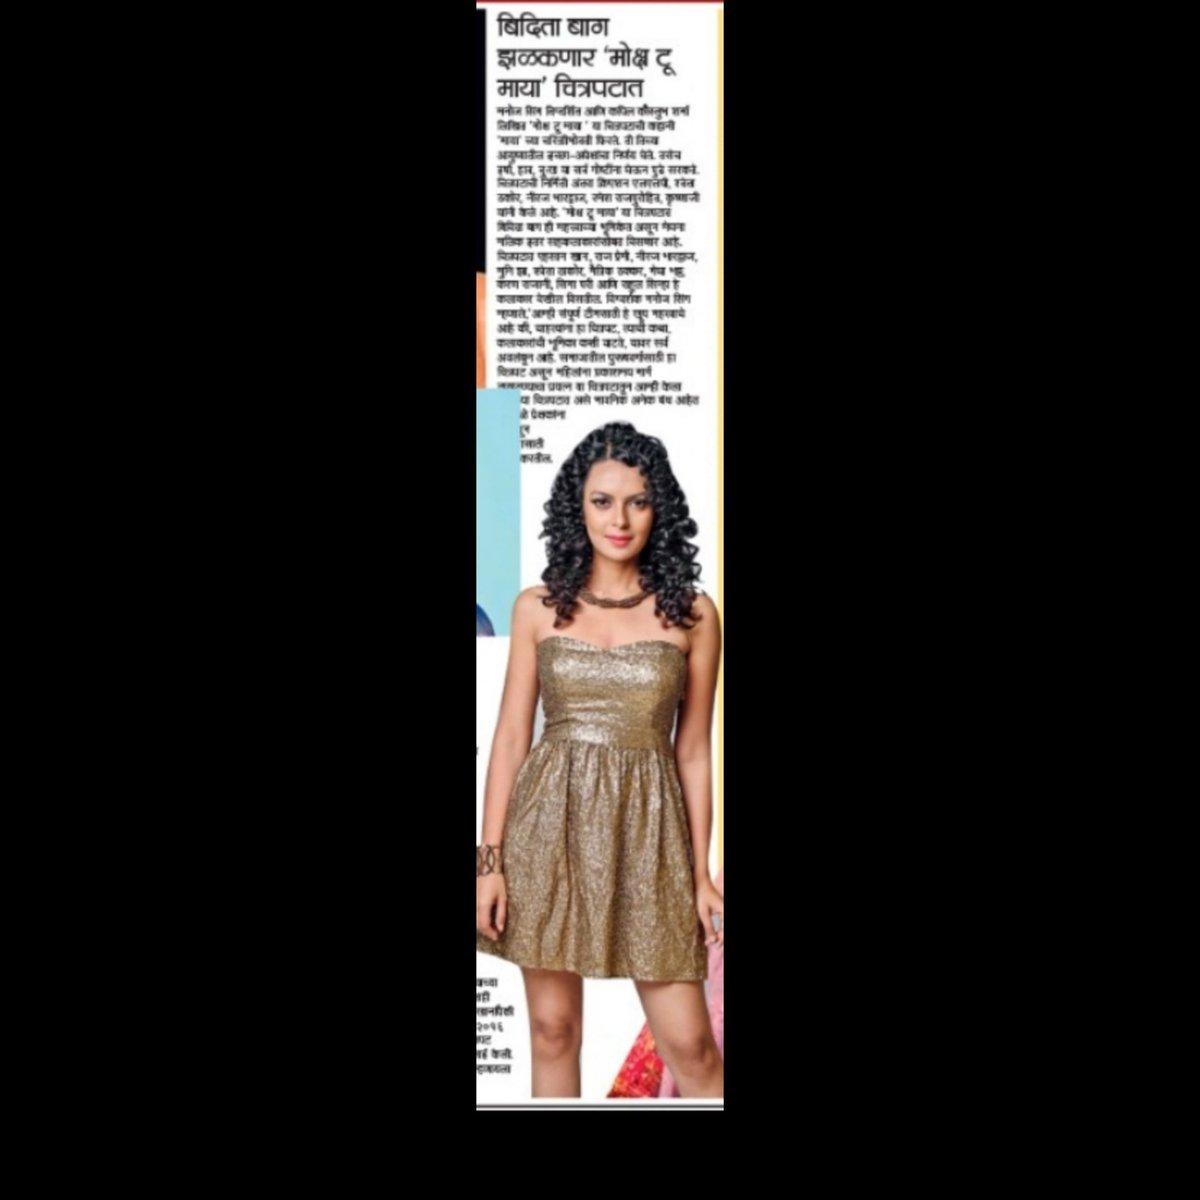 "@biditabag talks about her new  upcoming film ""Moksh To Maya"" @LokmatNewsHindi  #mokshtomaya #biditabag #bollywoodnews #latestbollywoodnews #newbollywoodfilm #latestmovie"